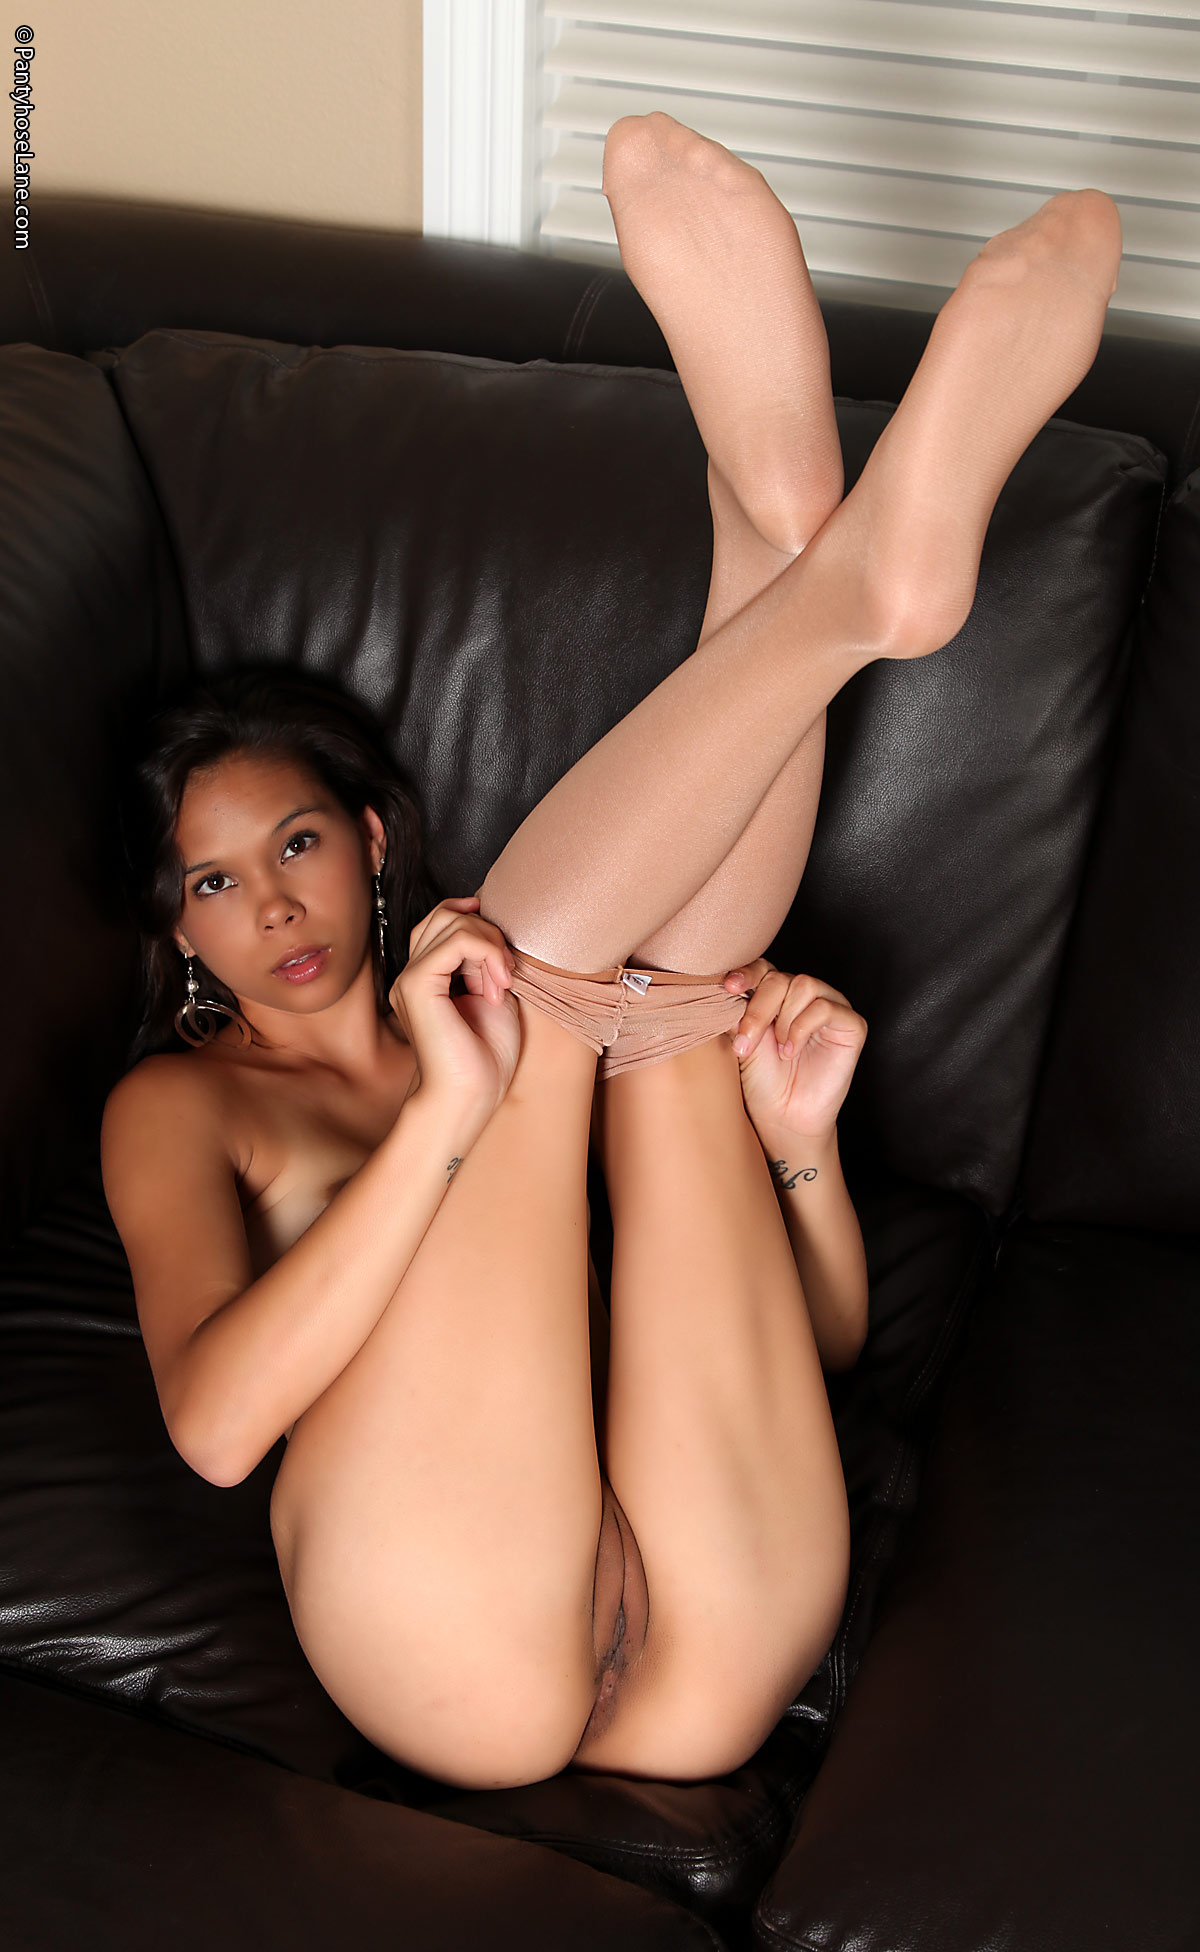 Nipples Fucking Keri Love Nude Model